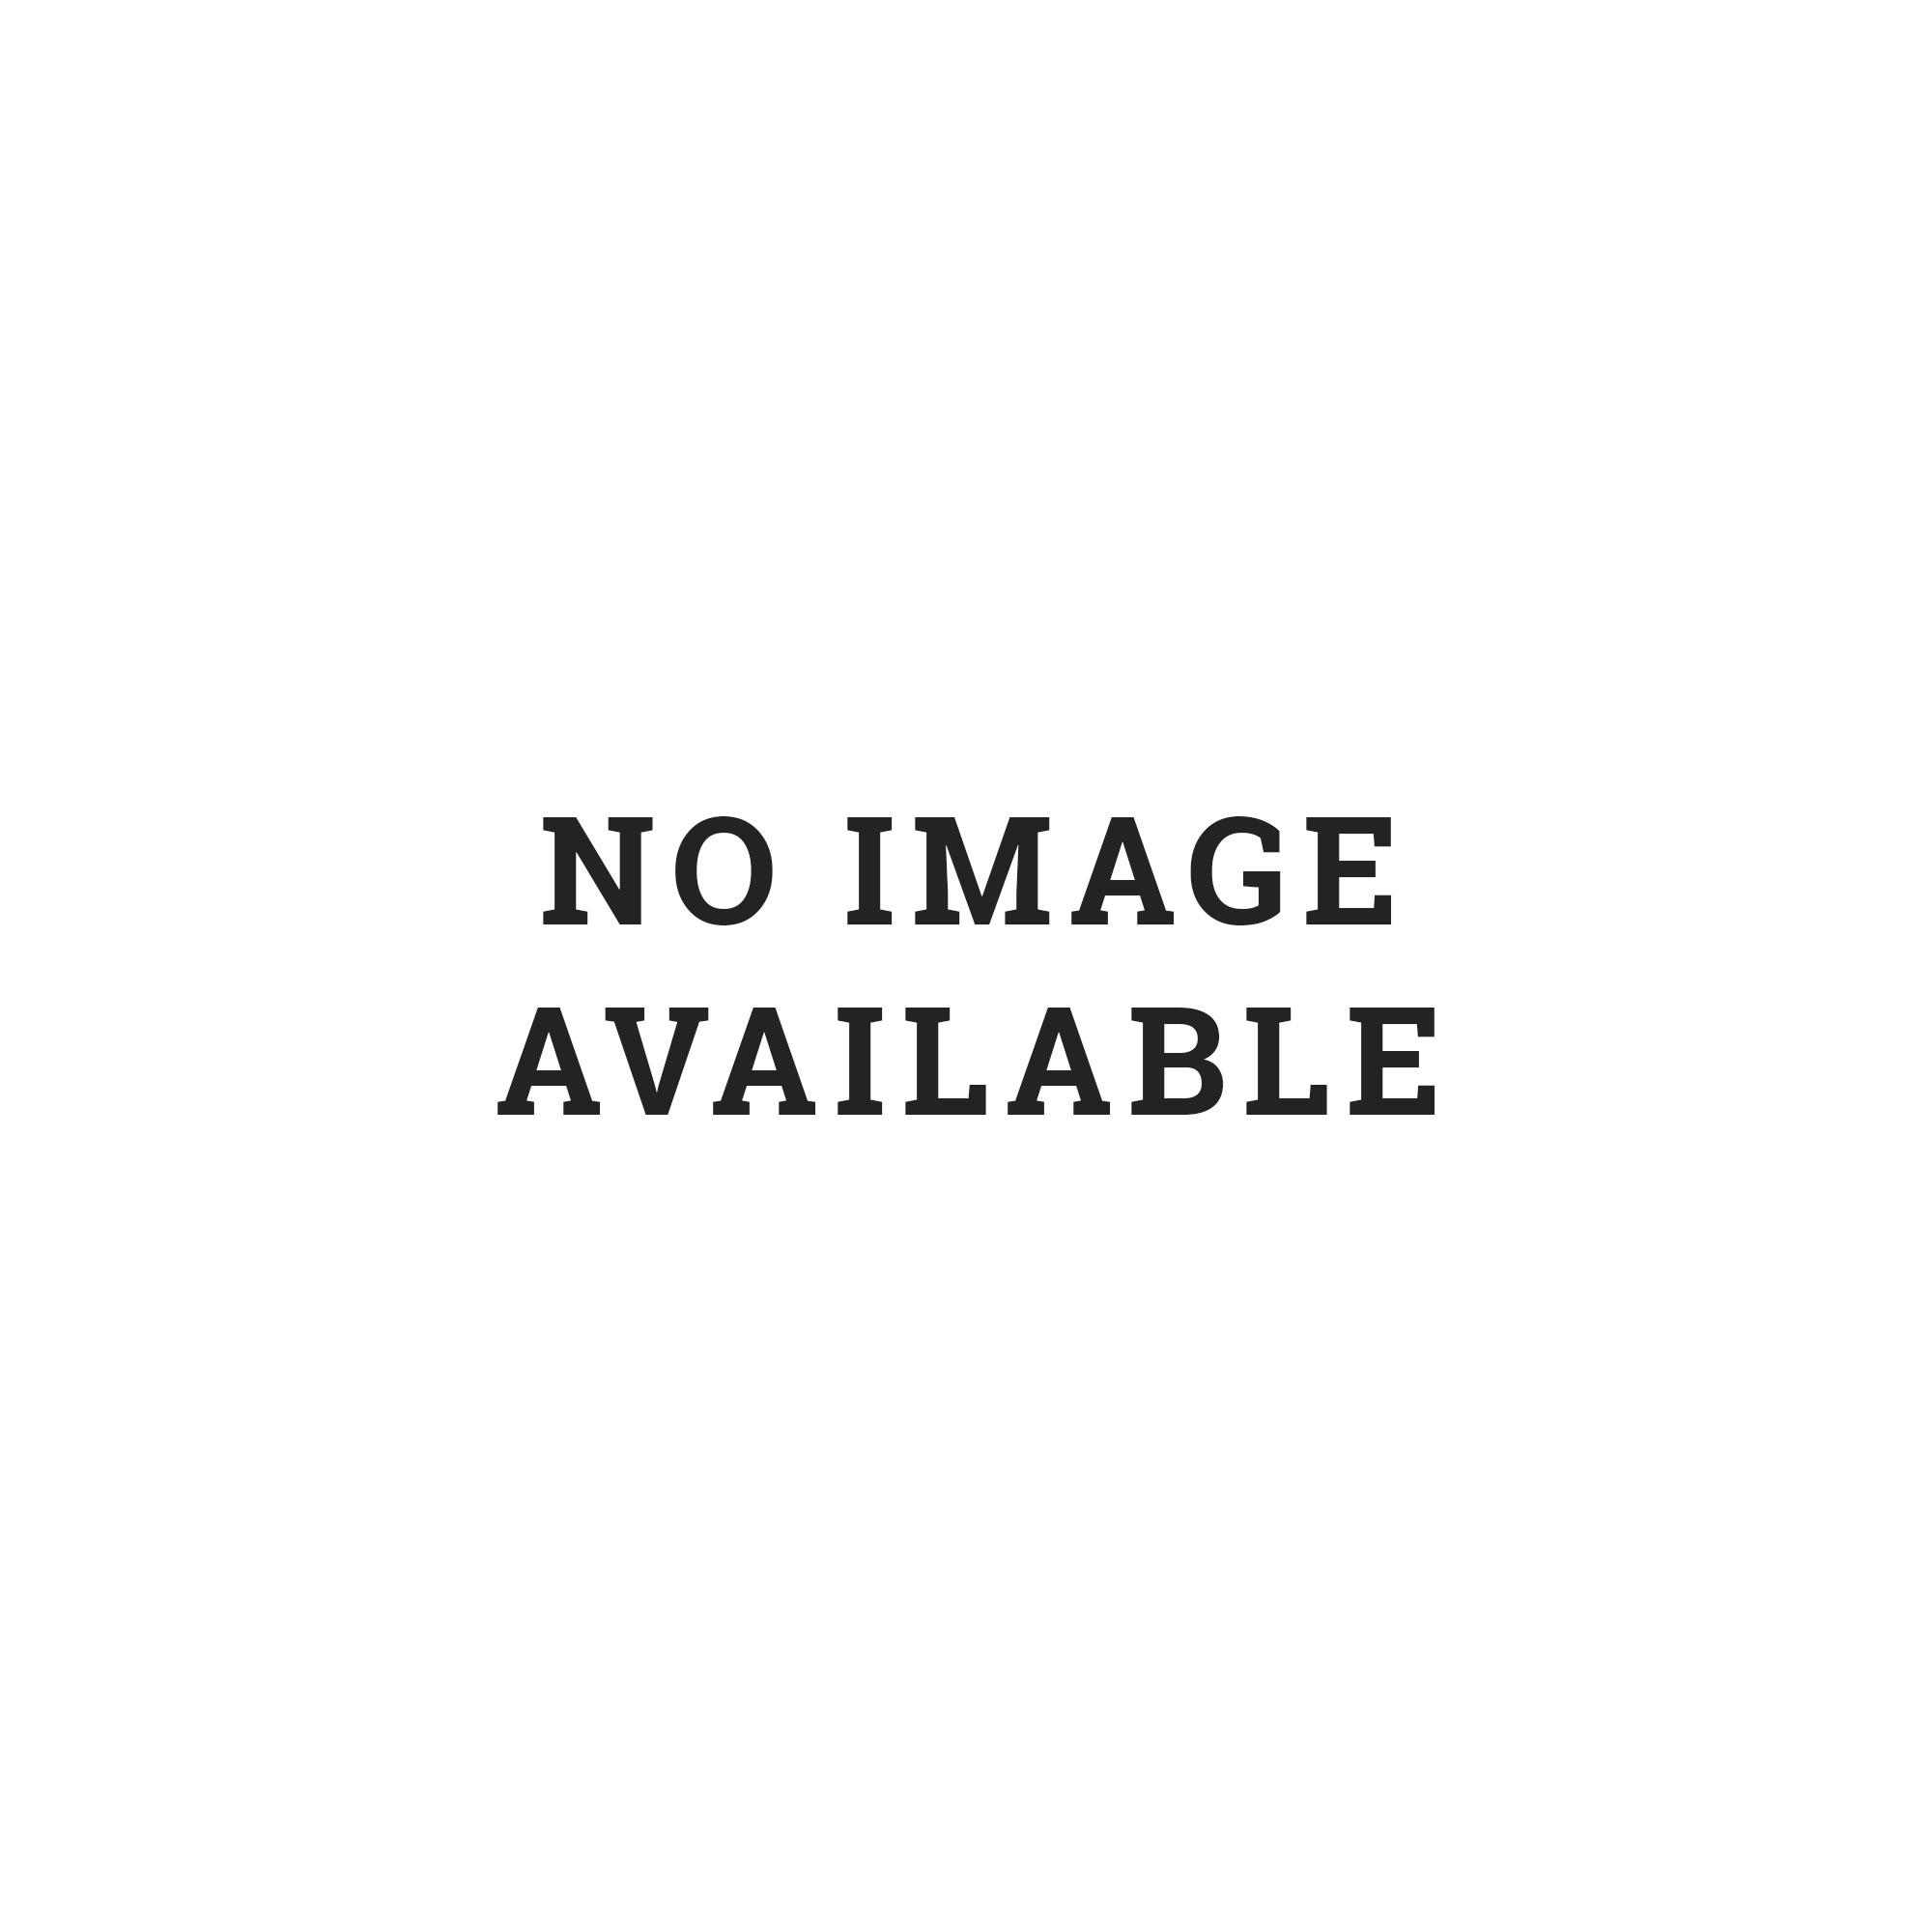 Dr Martens 8053 Unisex Leather 5-Eyelet Shoes - White & Black Aztec